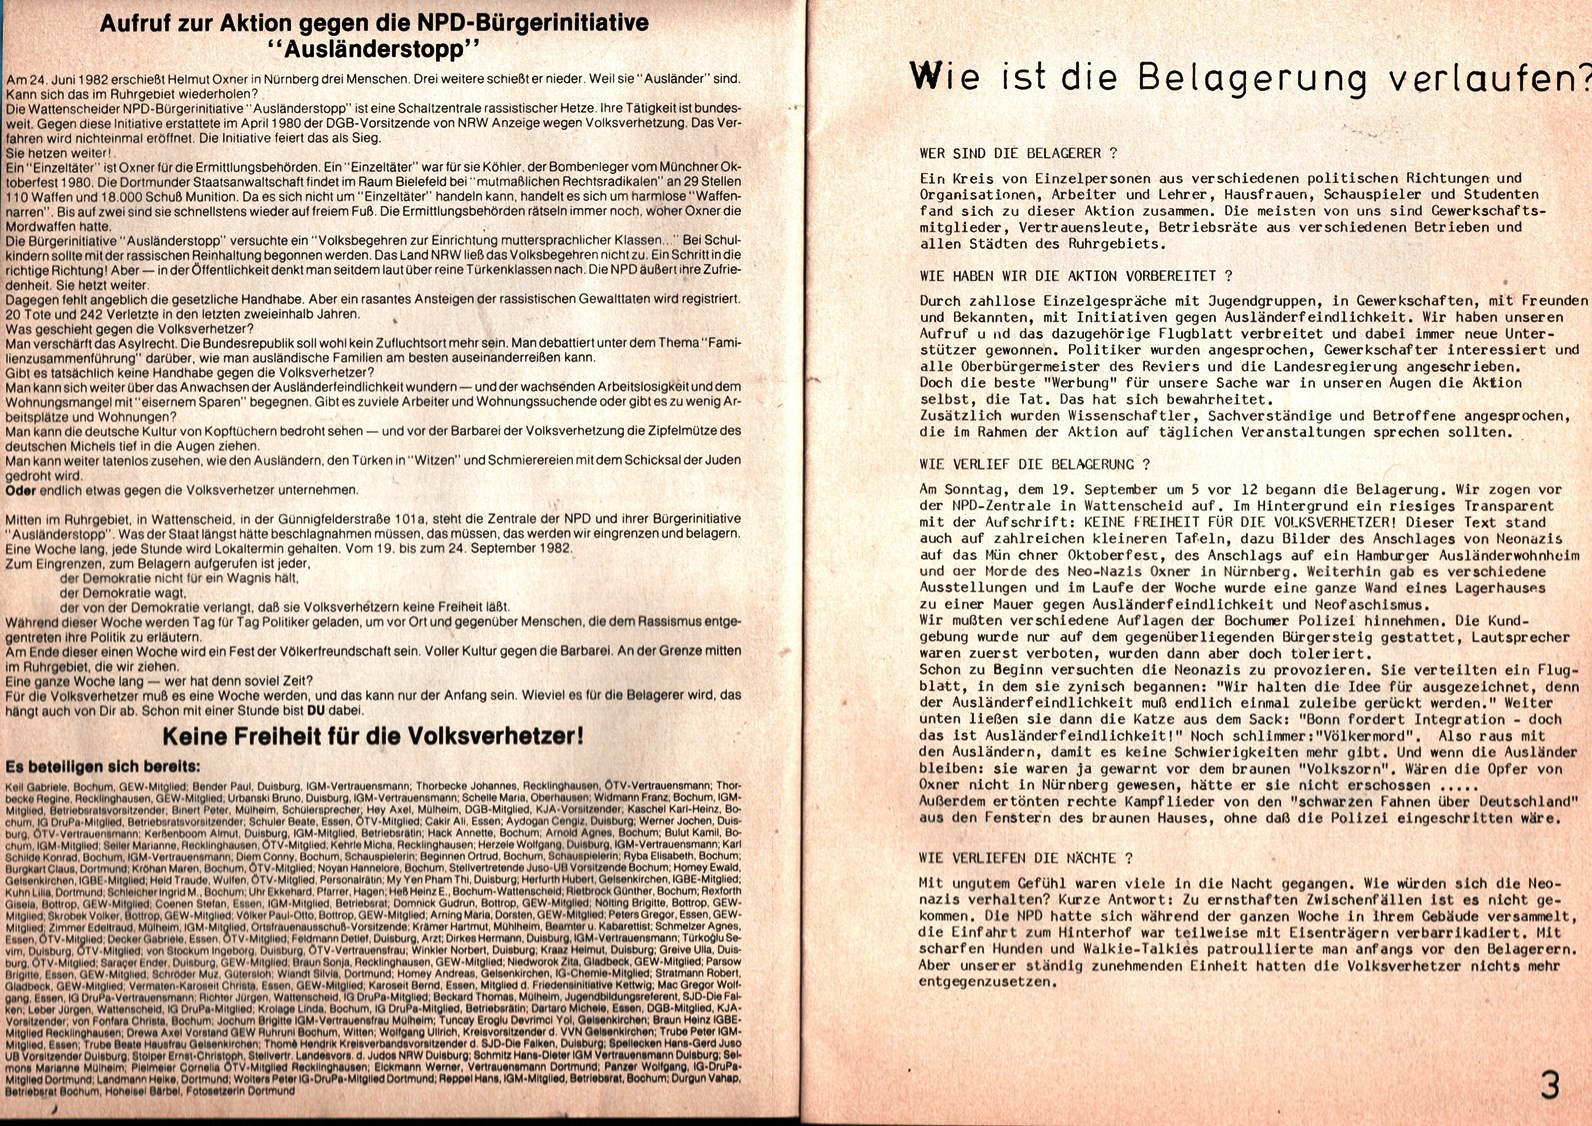 Bochum_1982_BI_Auslaenderstopp_belagern_003